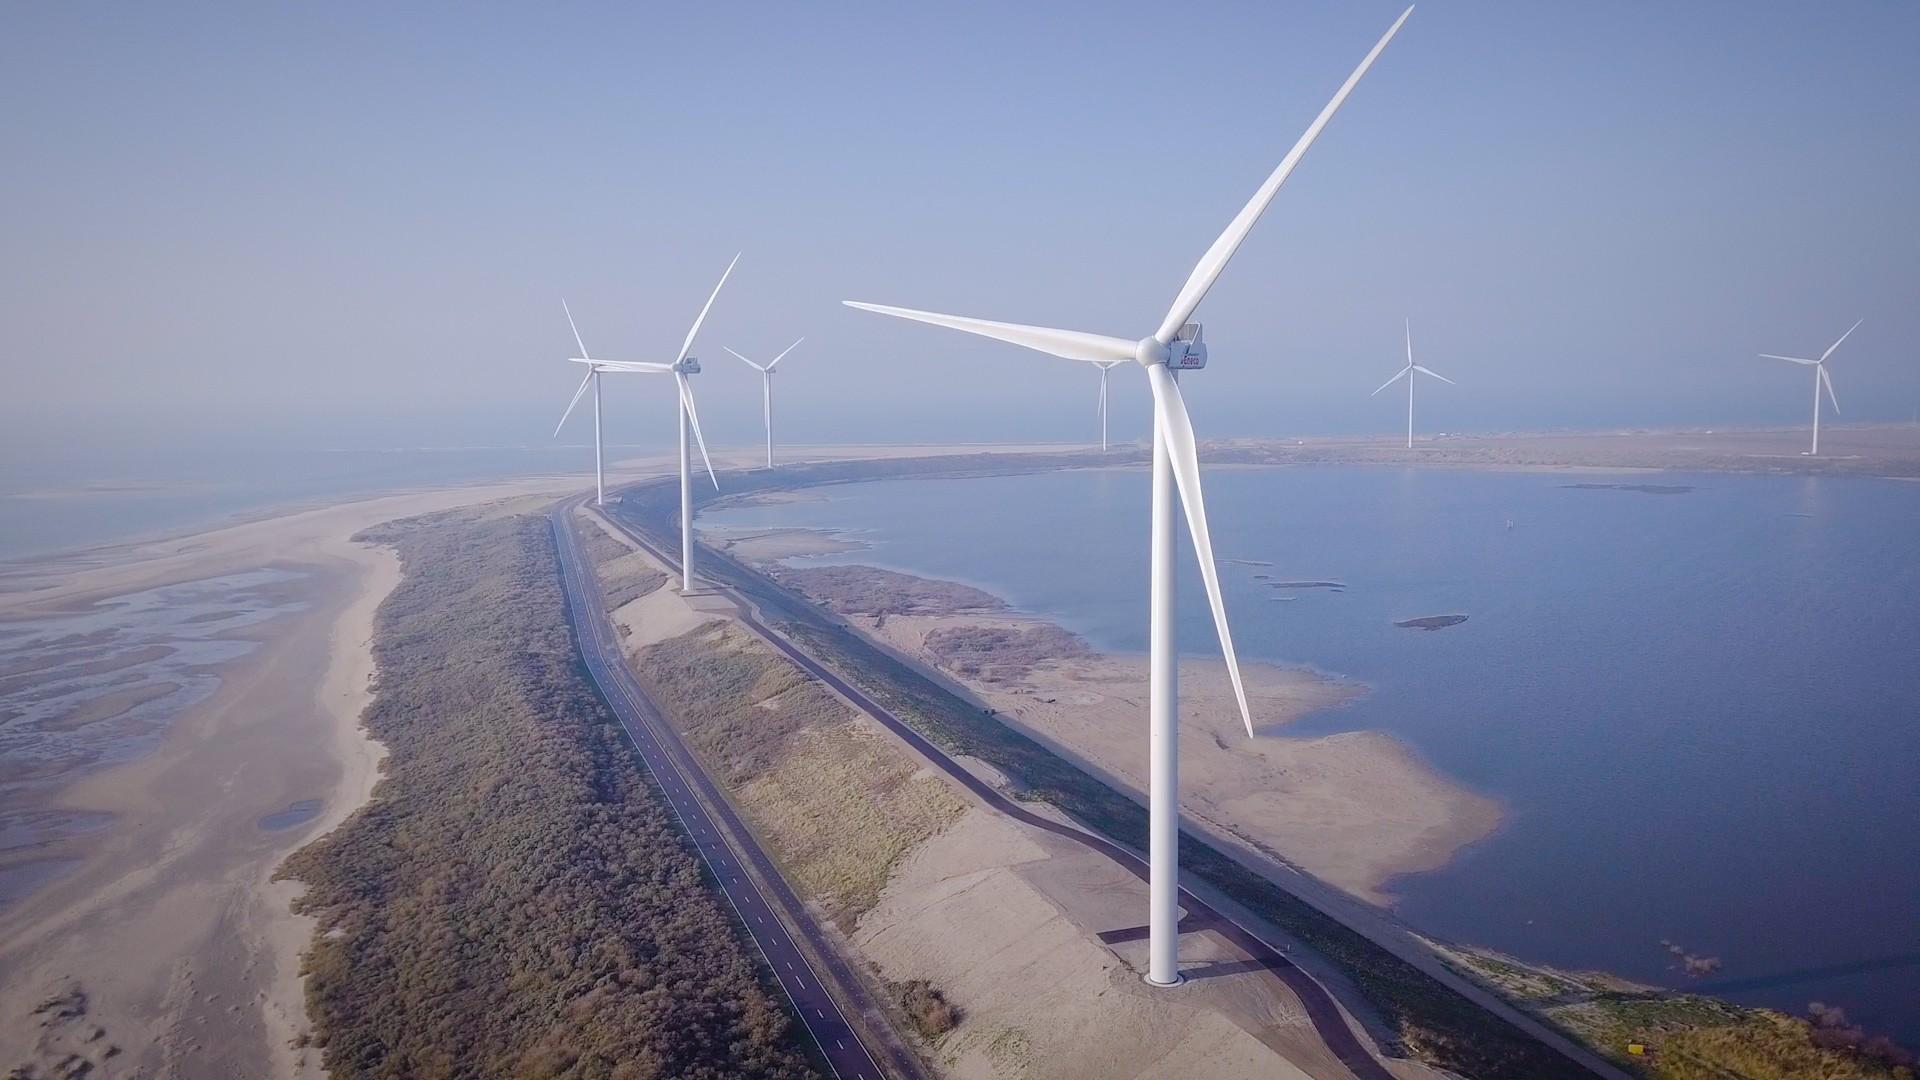 Eneco realiseert windpark op <br> Maasvlakte 2